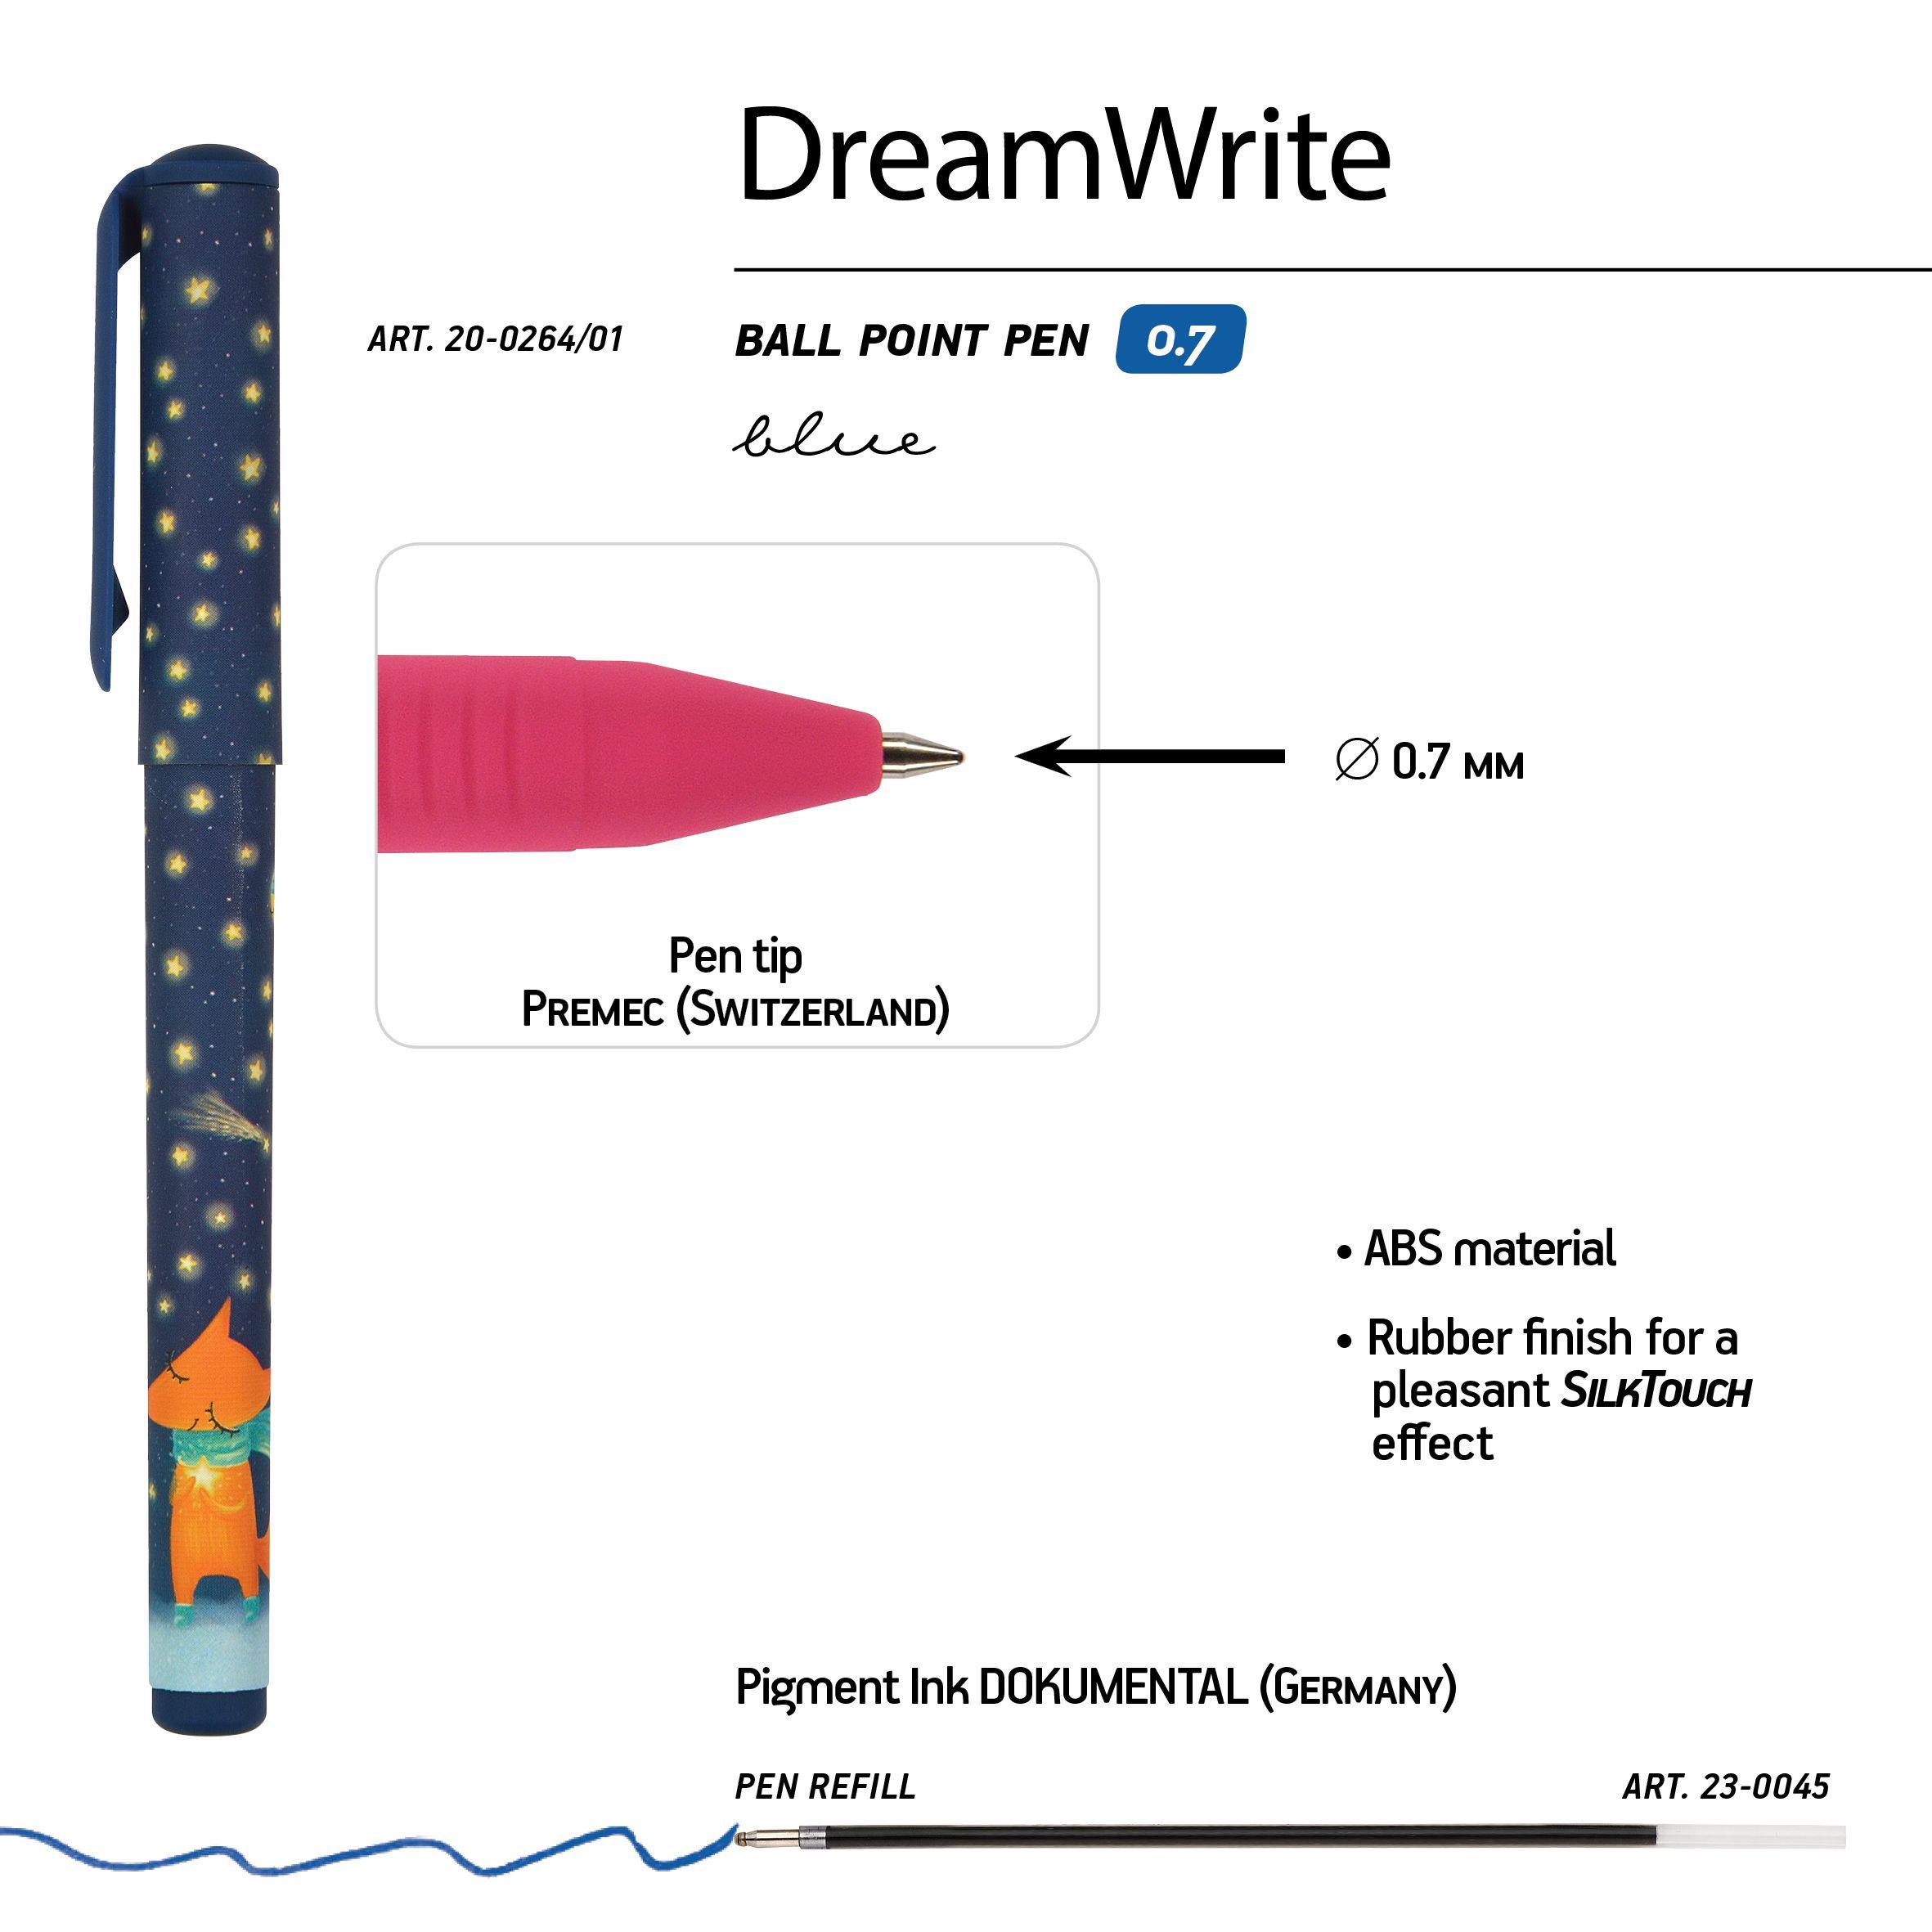 Ручка подар. BV синяя 0,7мм DreamWrite Лисята 3 вида